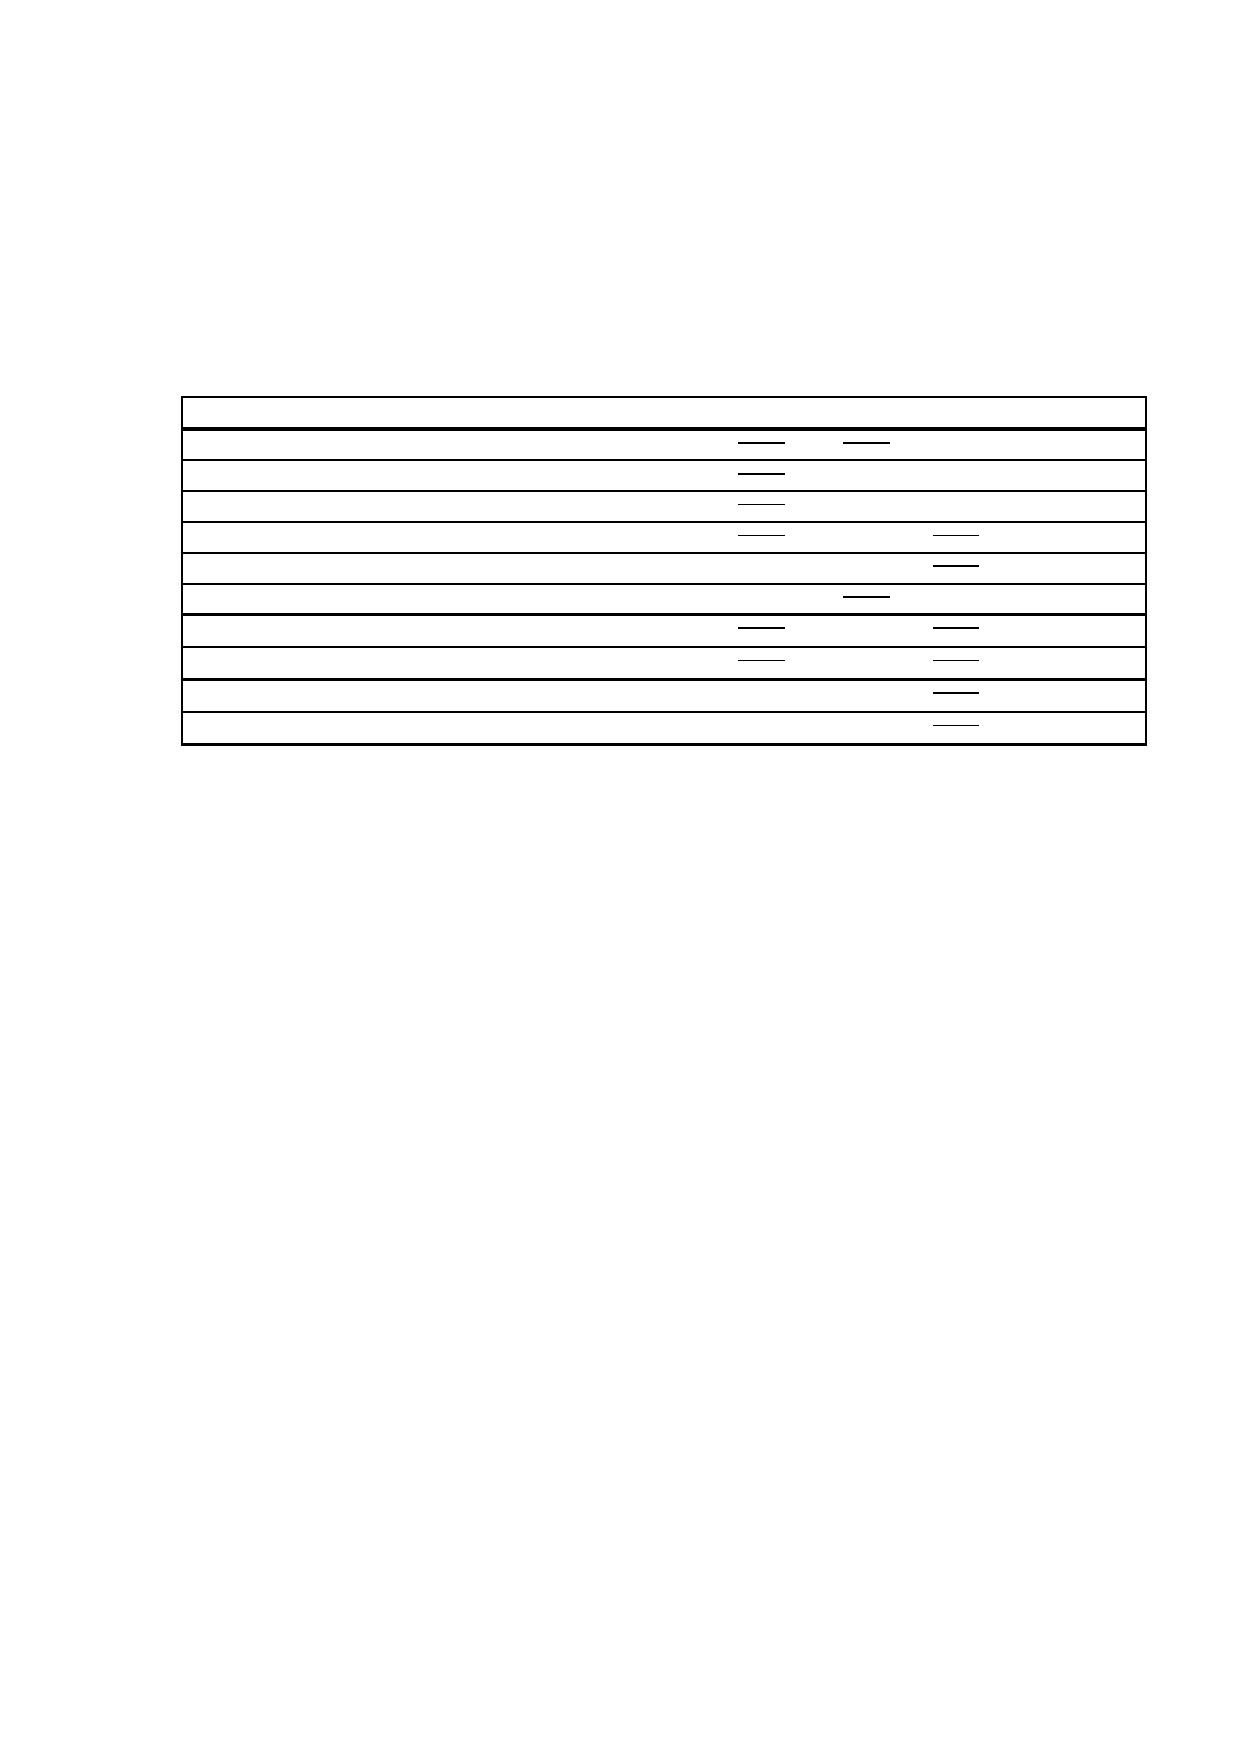 AS516 Даташит, Описание, Даташиты